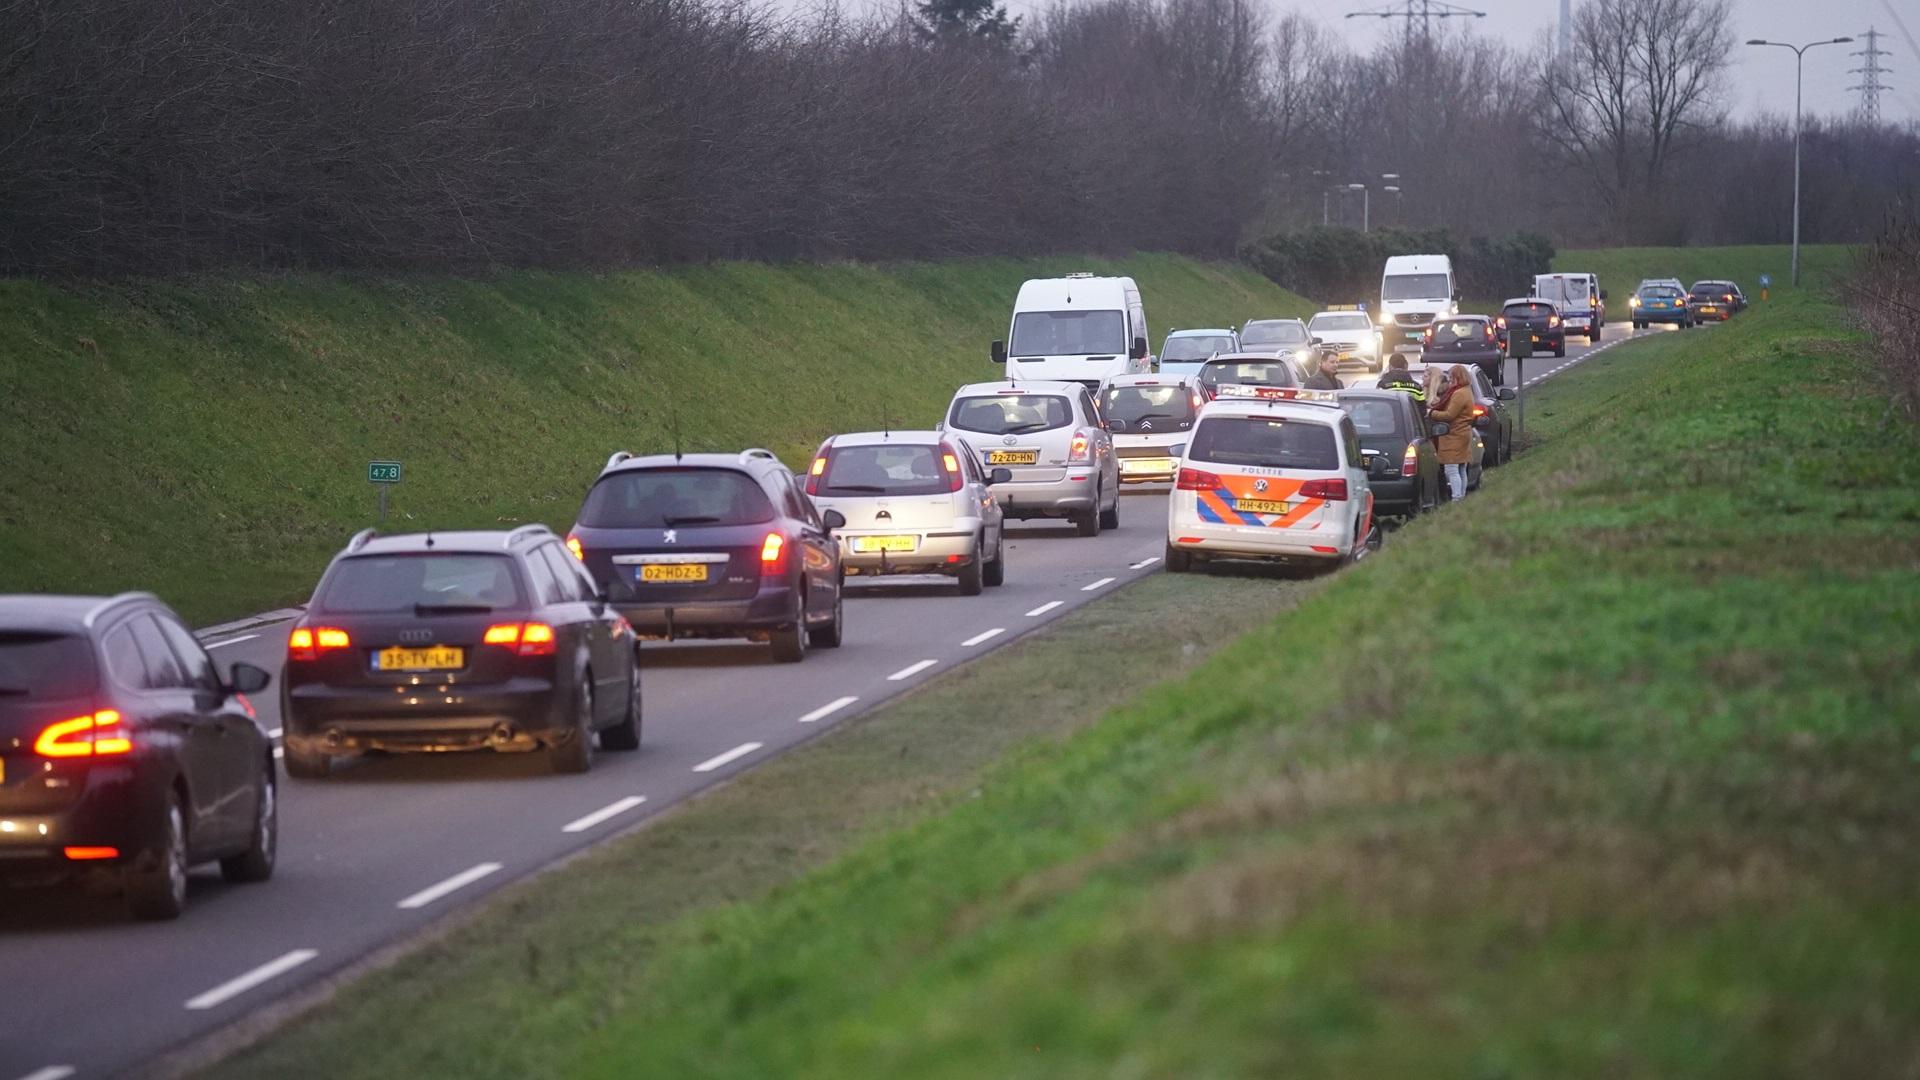 Kop-staartbotsing op N348 in Deventer leidt tot verkeerschaos.